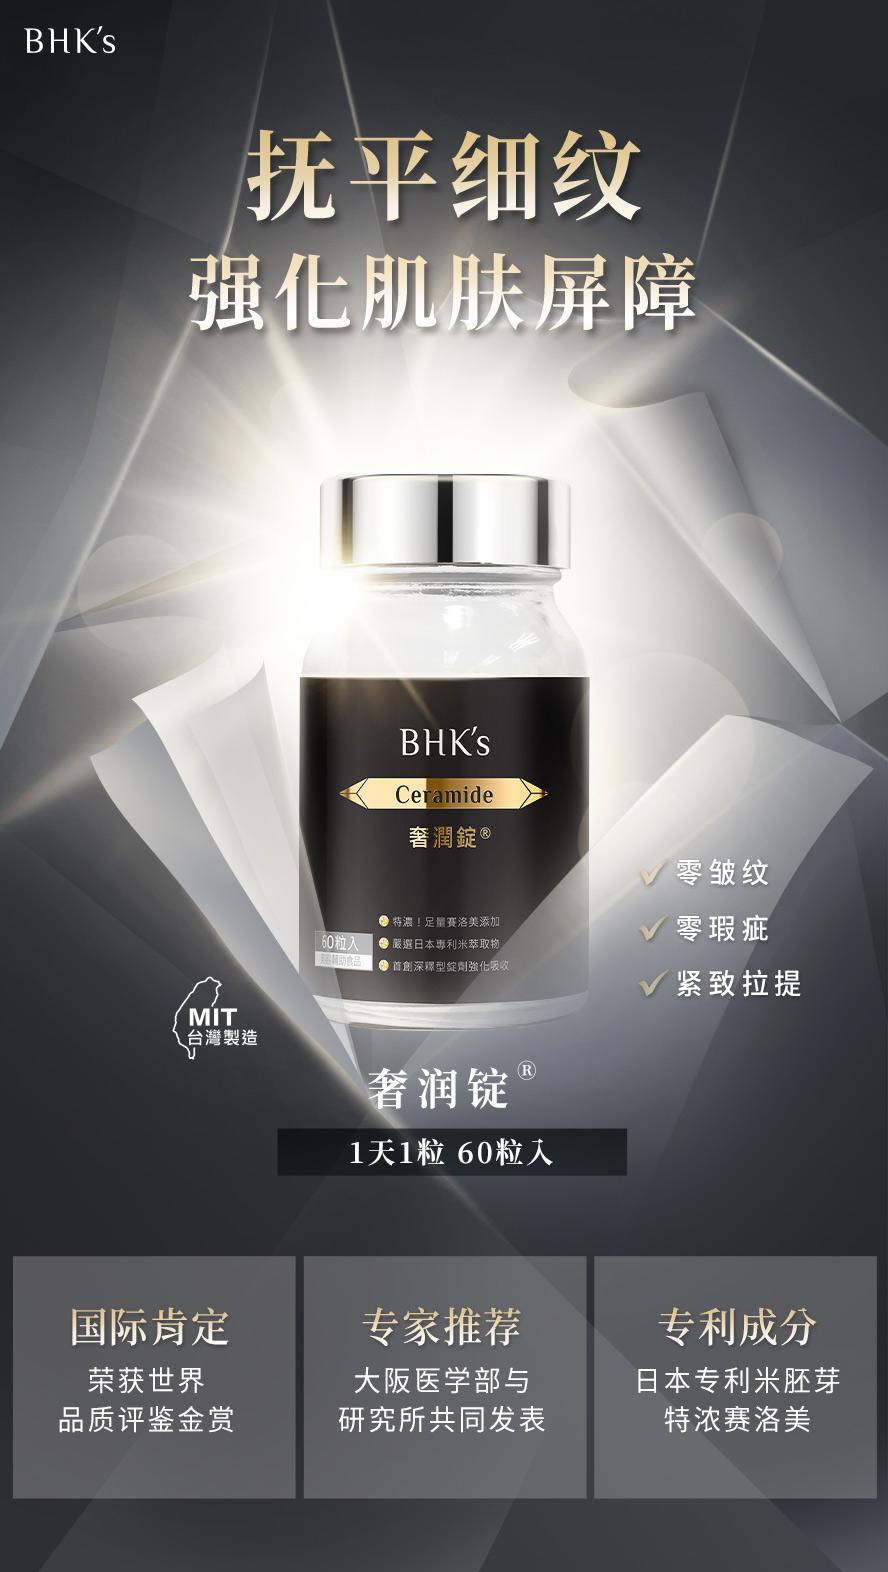 BHK's奢润锭超厉害,风靡日本的细润因子,有效减少皱纹对抗初老